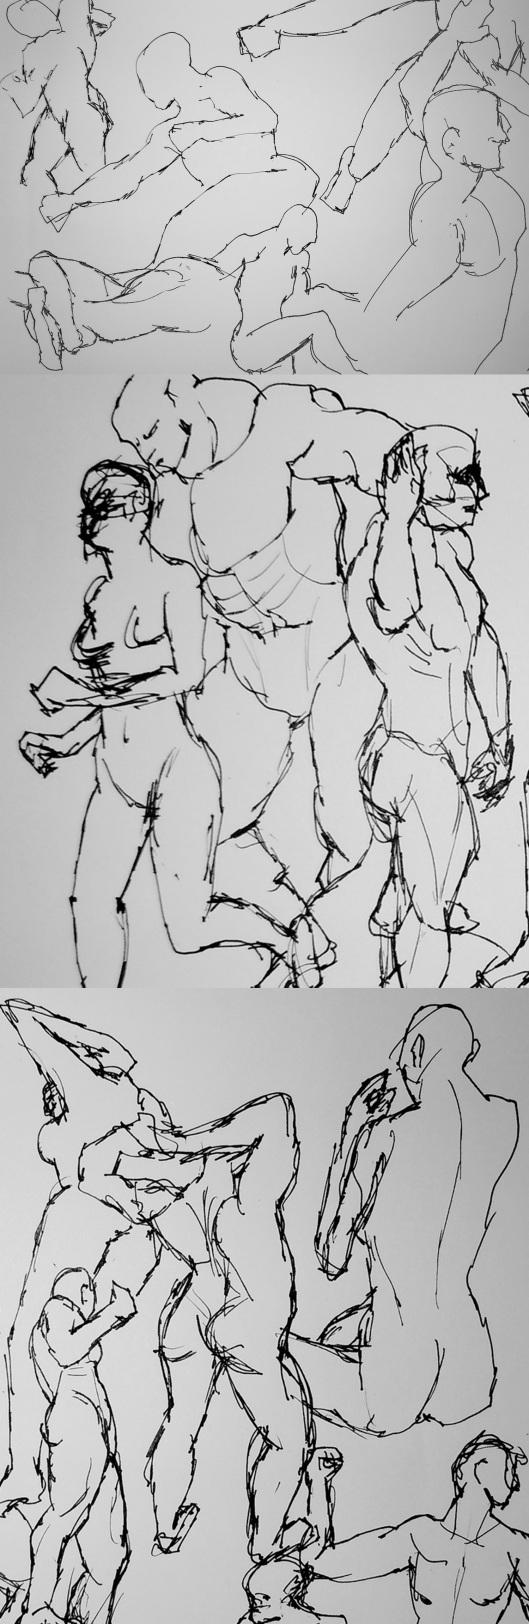 60sec_sketch_long_05